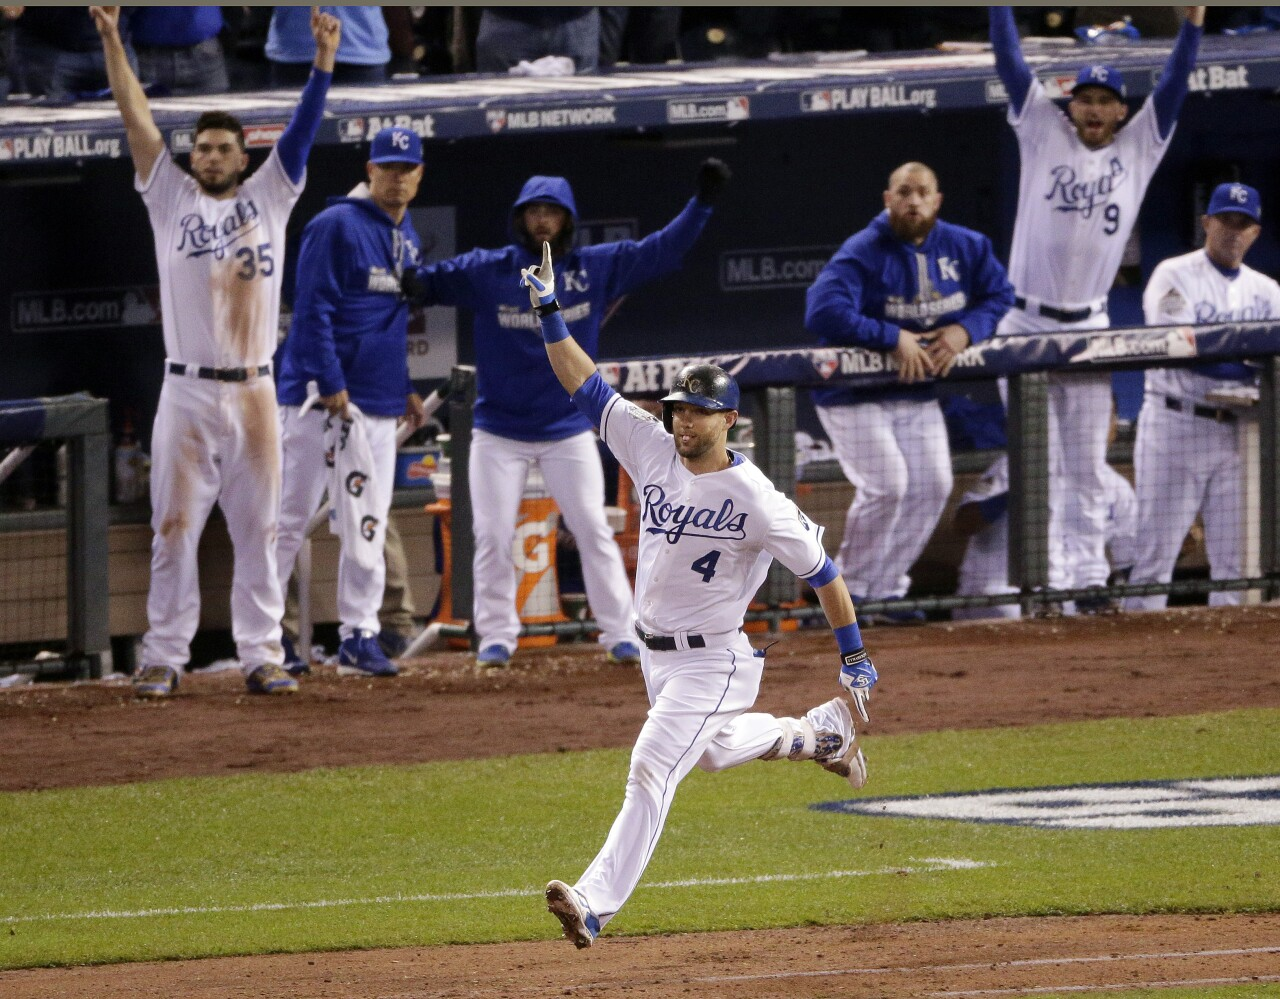 Royals Gordon Baseball